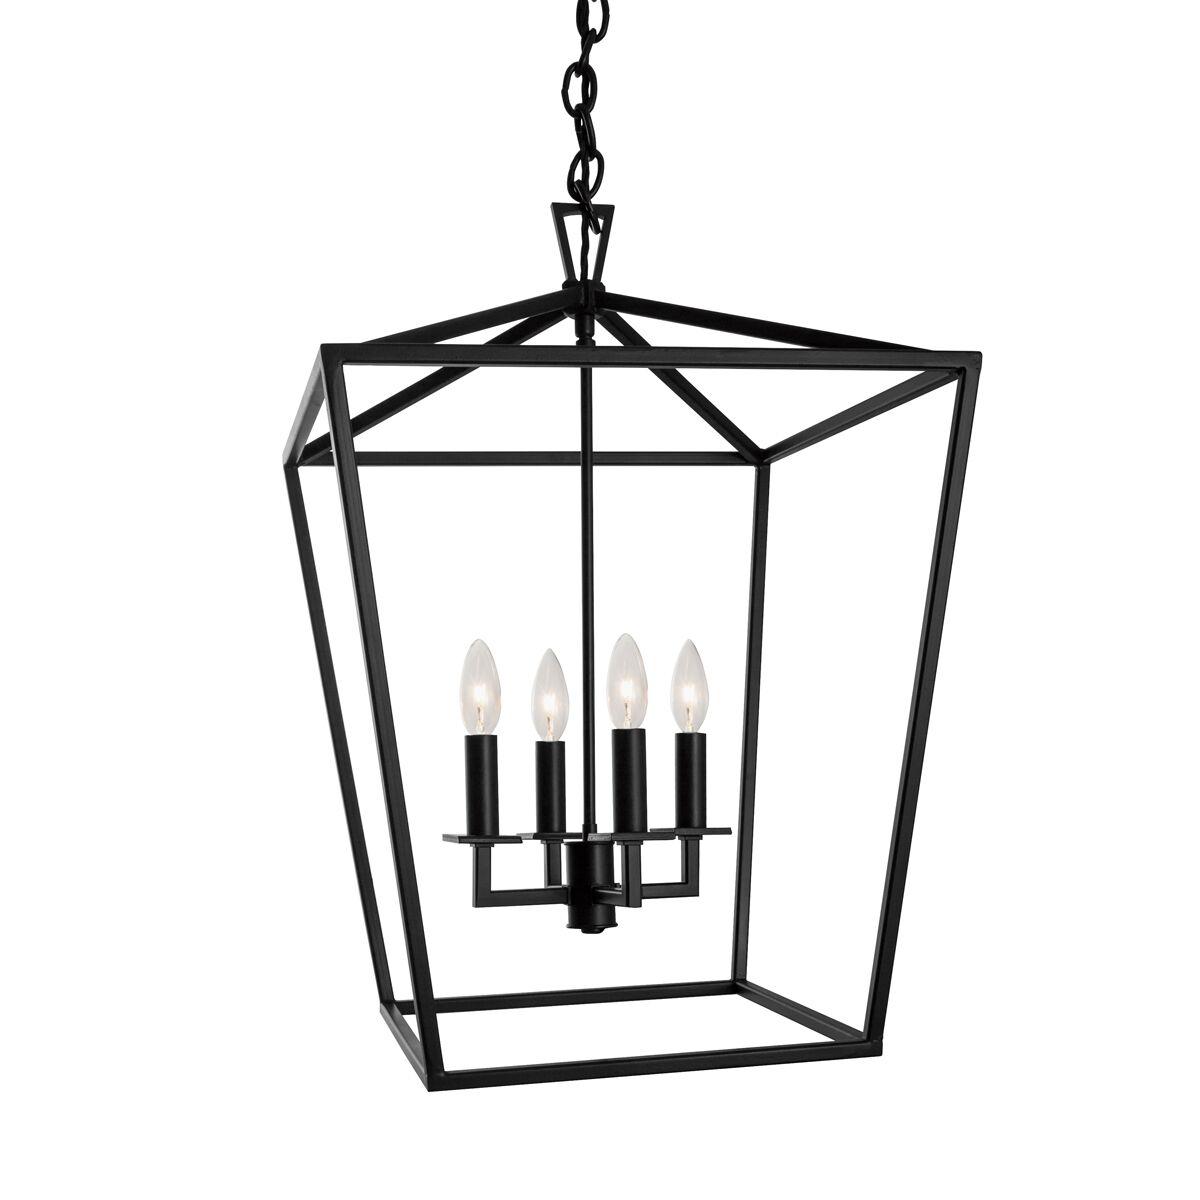 Noor Cage 4-Light Foyer Pendant Finish: Polished Nickel